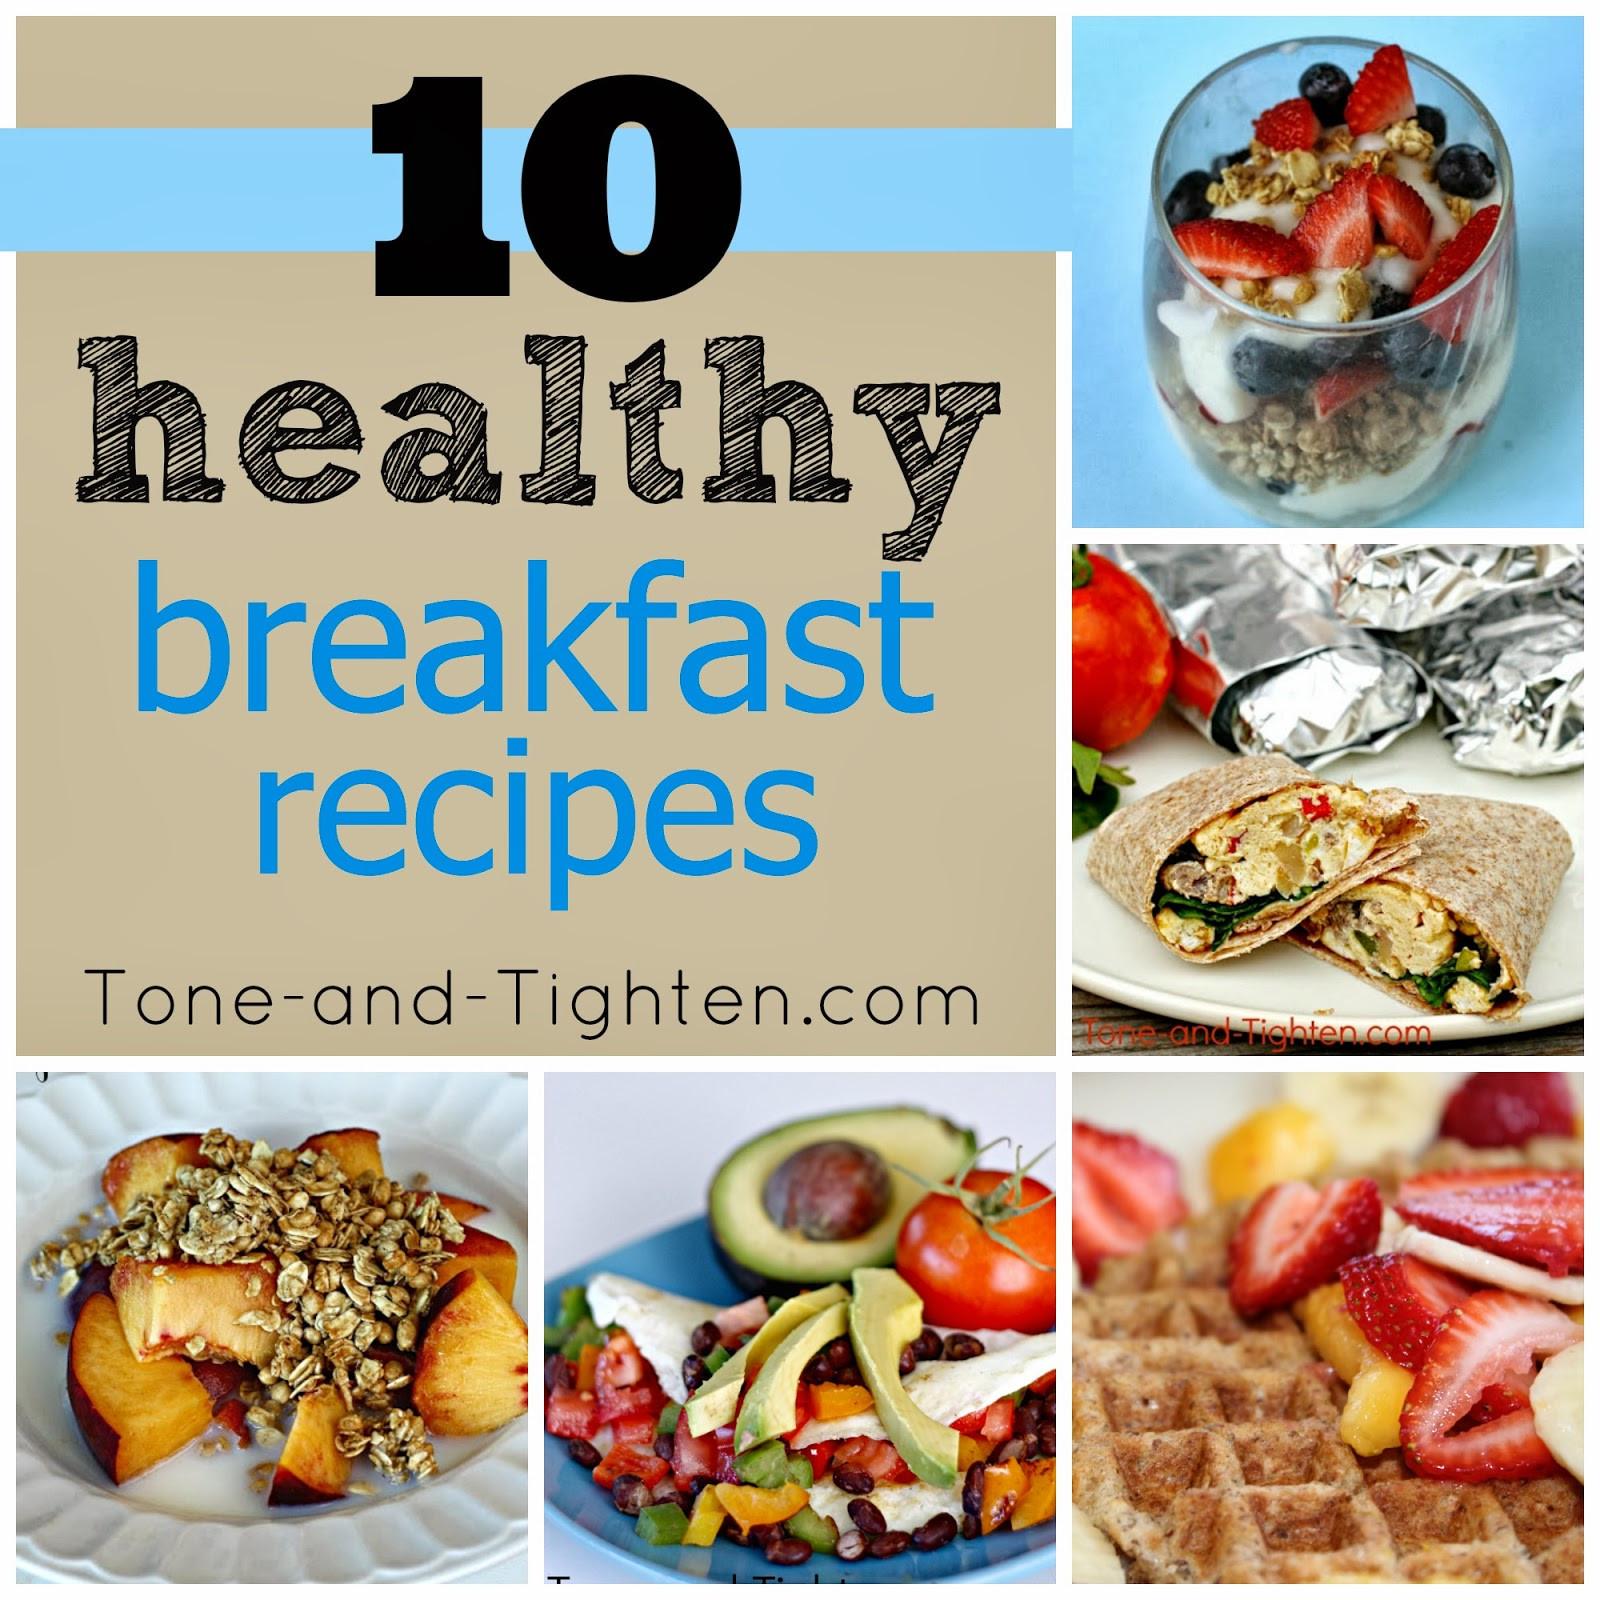 Healthy Recipe For Breakfast  10 QUICK Healthy Breakfast Recipes